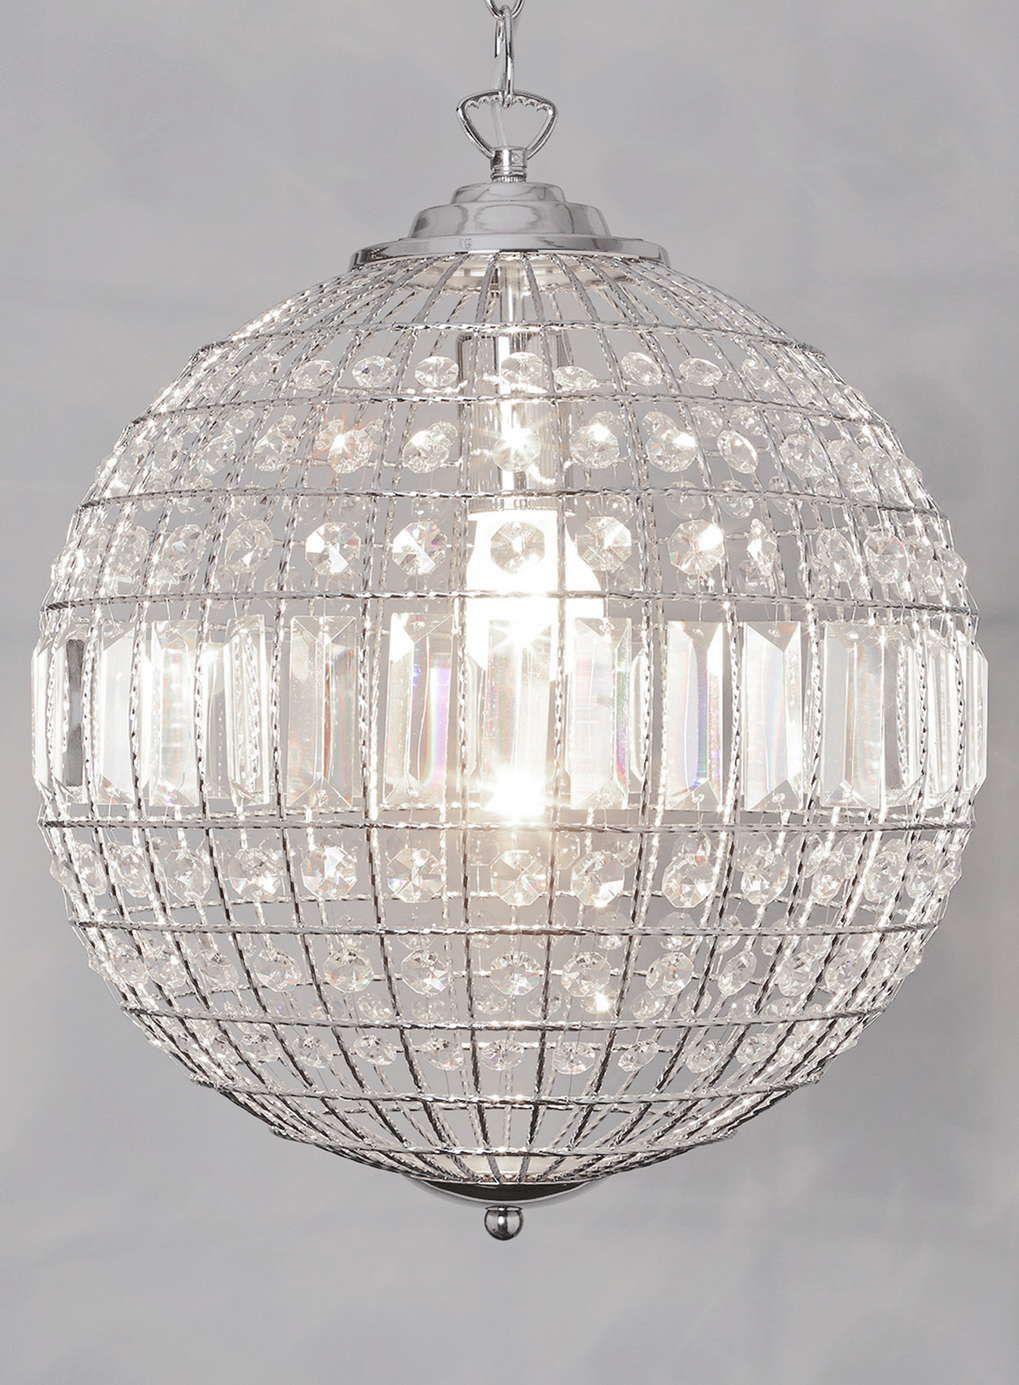 Photo 1 of ursula small crystal ball pendant light lighting photo 1 of ursula small crystal ball pendant light arubaitofo Images